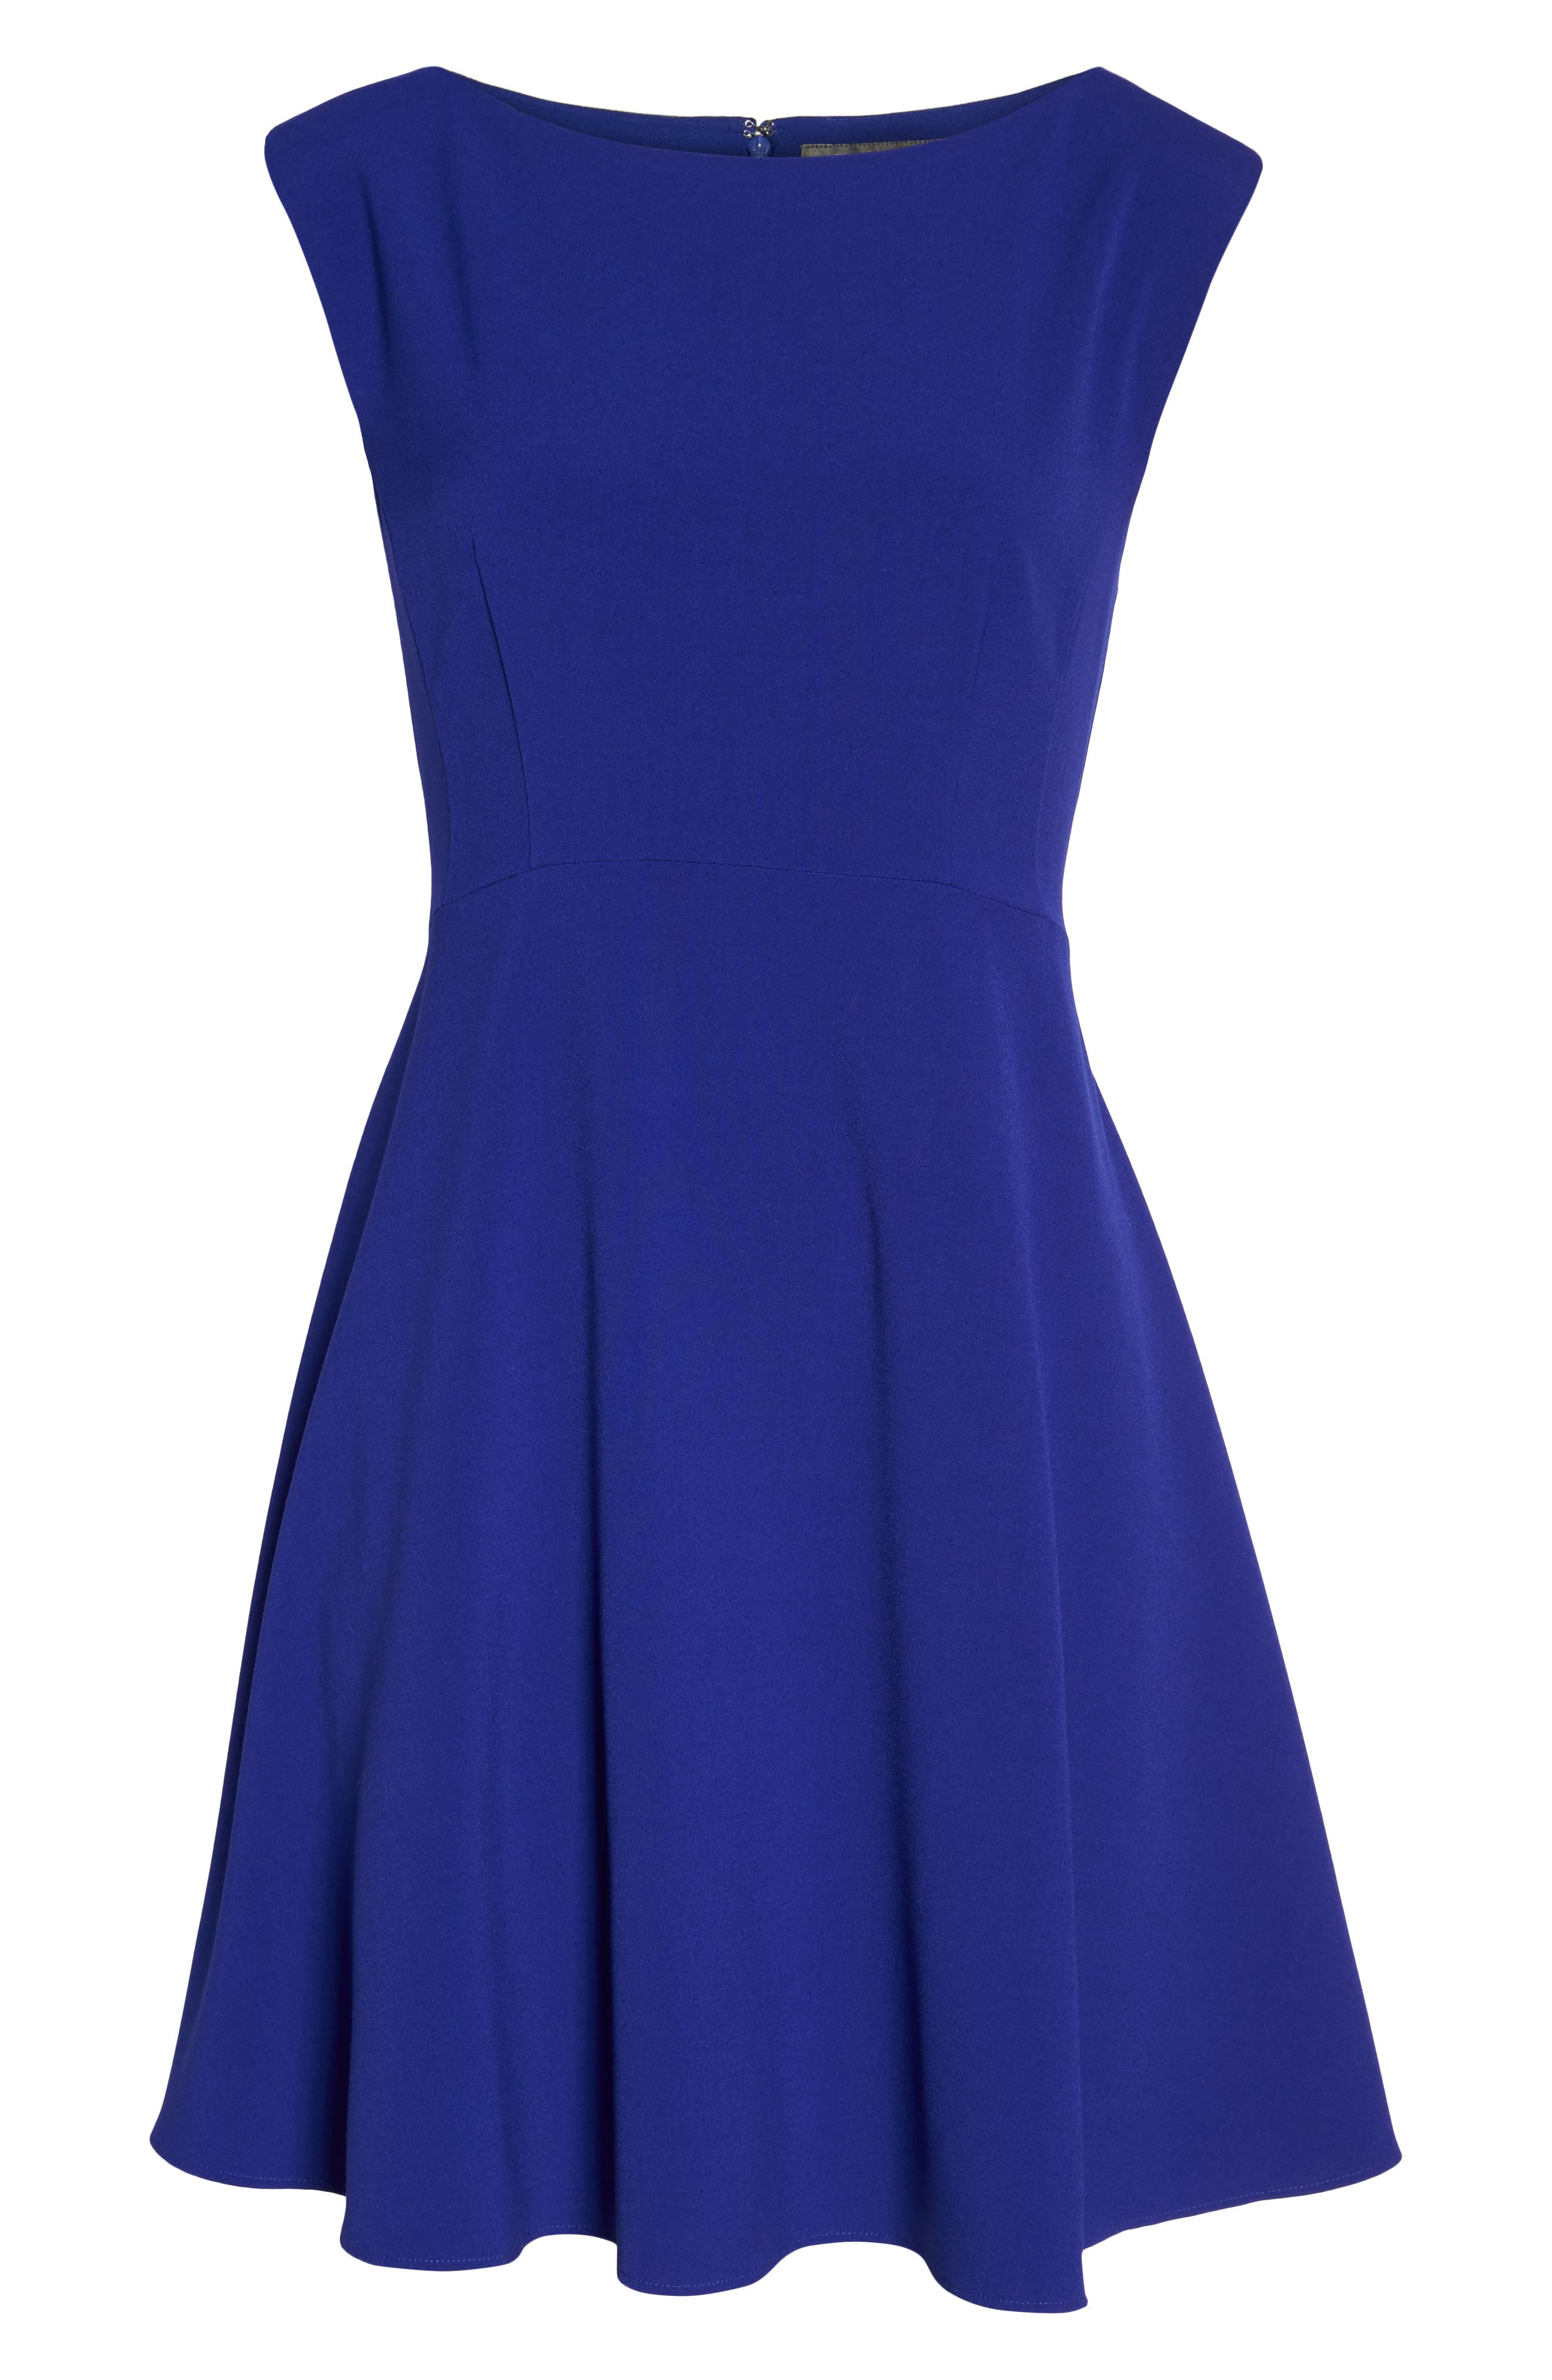 Whisper Ruth Fit & Flare Dress,                             Alternate thumbnail 7, color,                             405